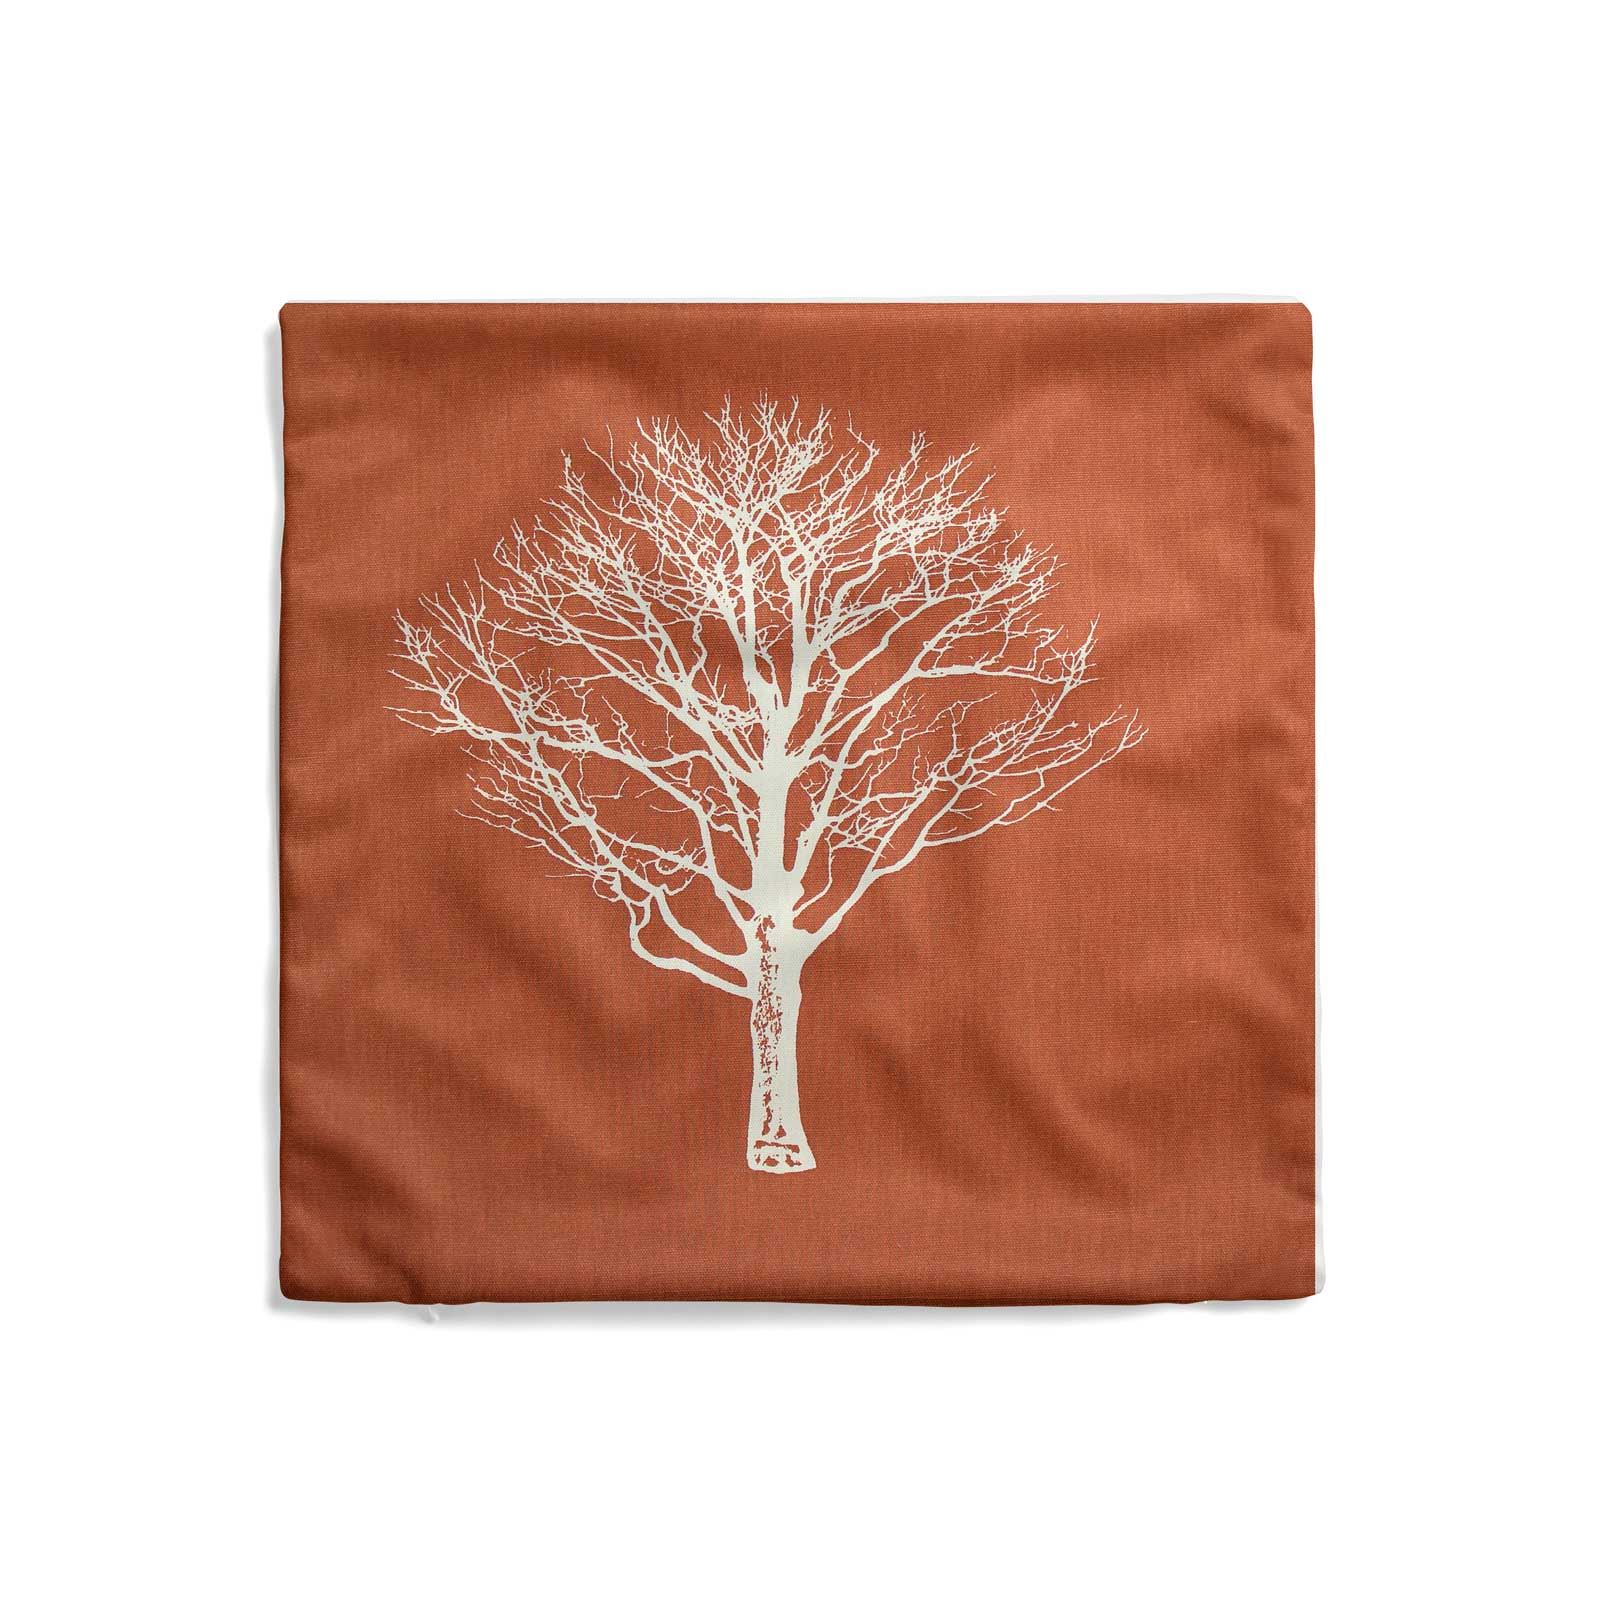 Woodland-Trees-Cushion-Cover-Modern-Reversible-Tree-Print-Covers-17-034-x-17-034 thumbnail 12